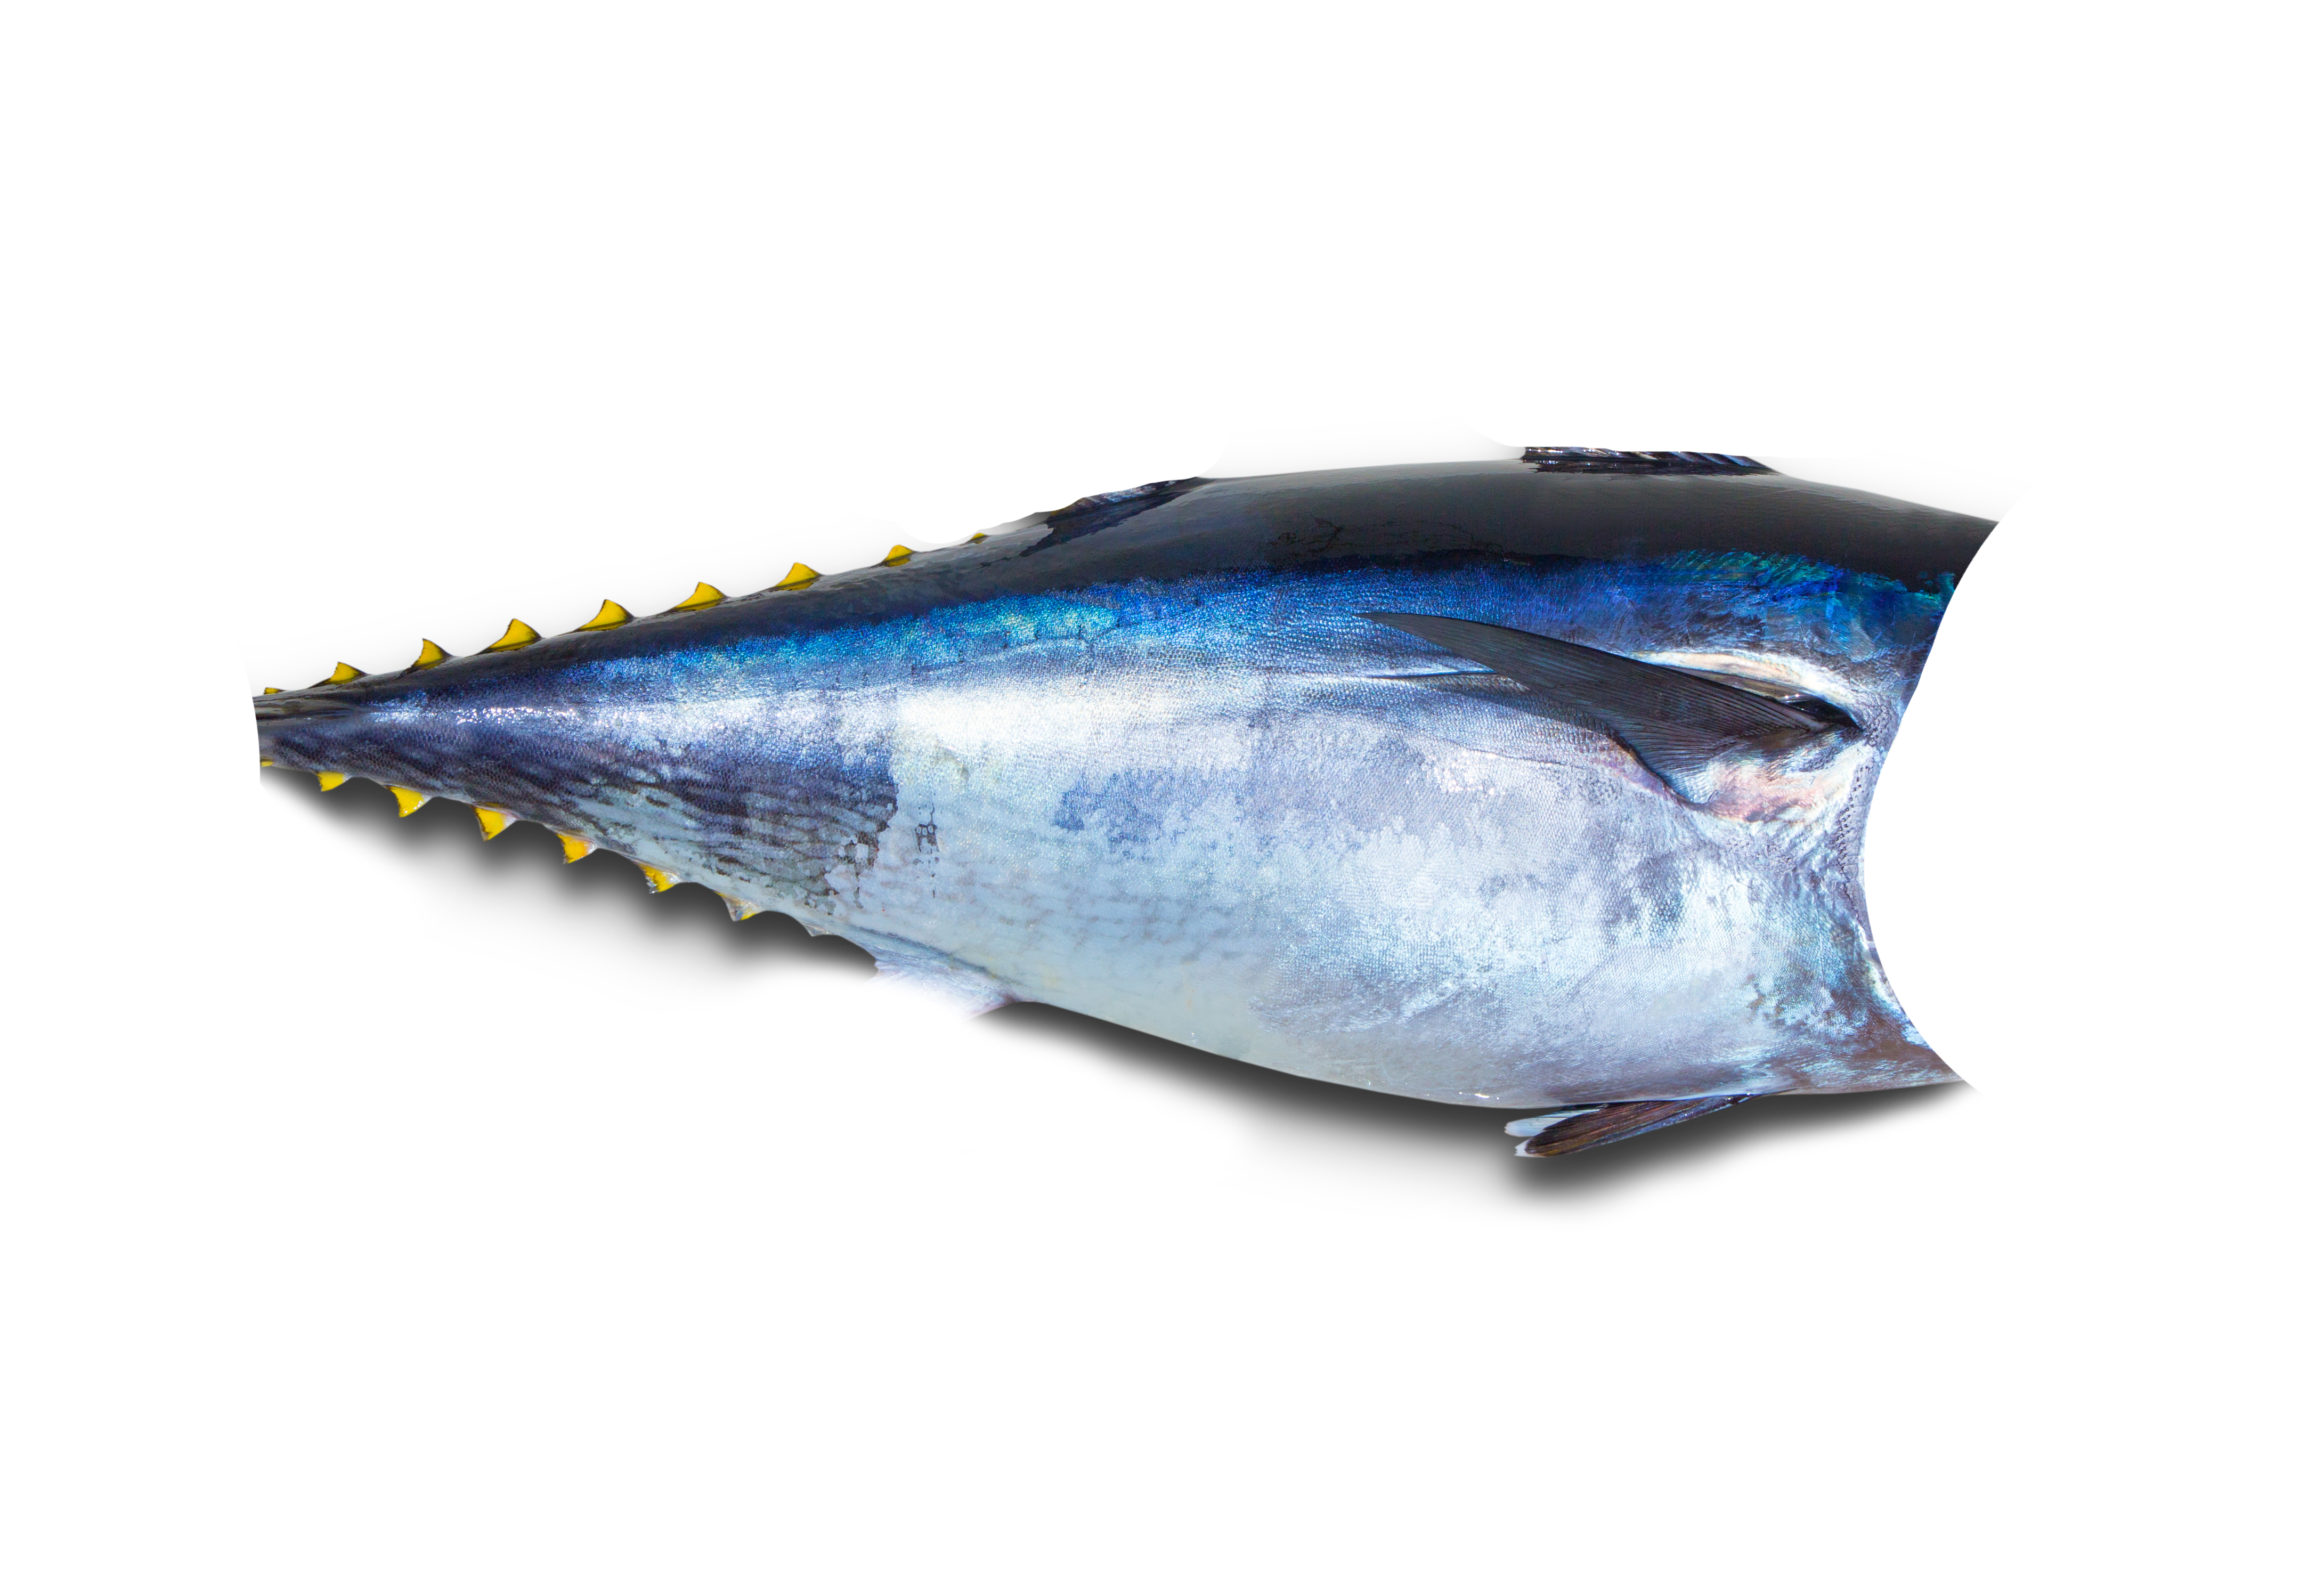 Corvina fish nutrition besto blog for Blue fin fish